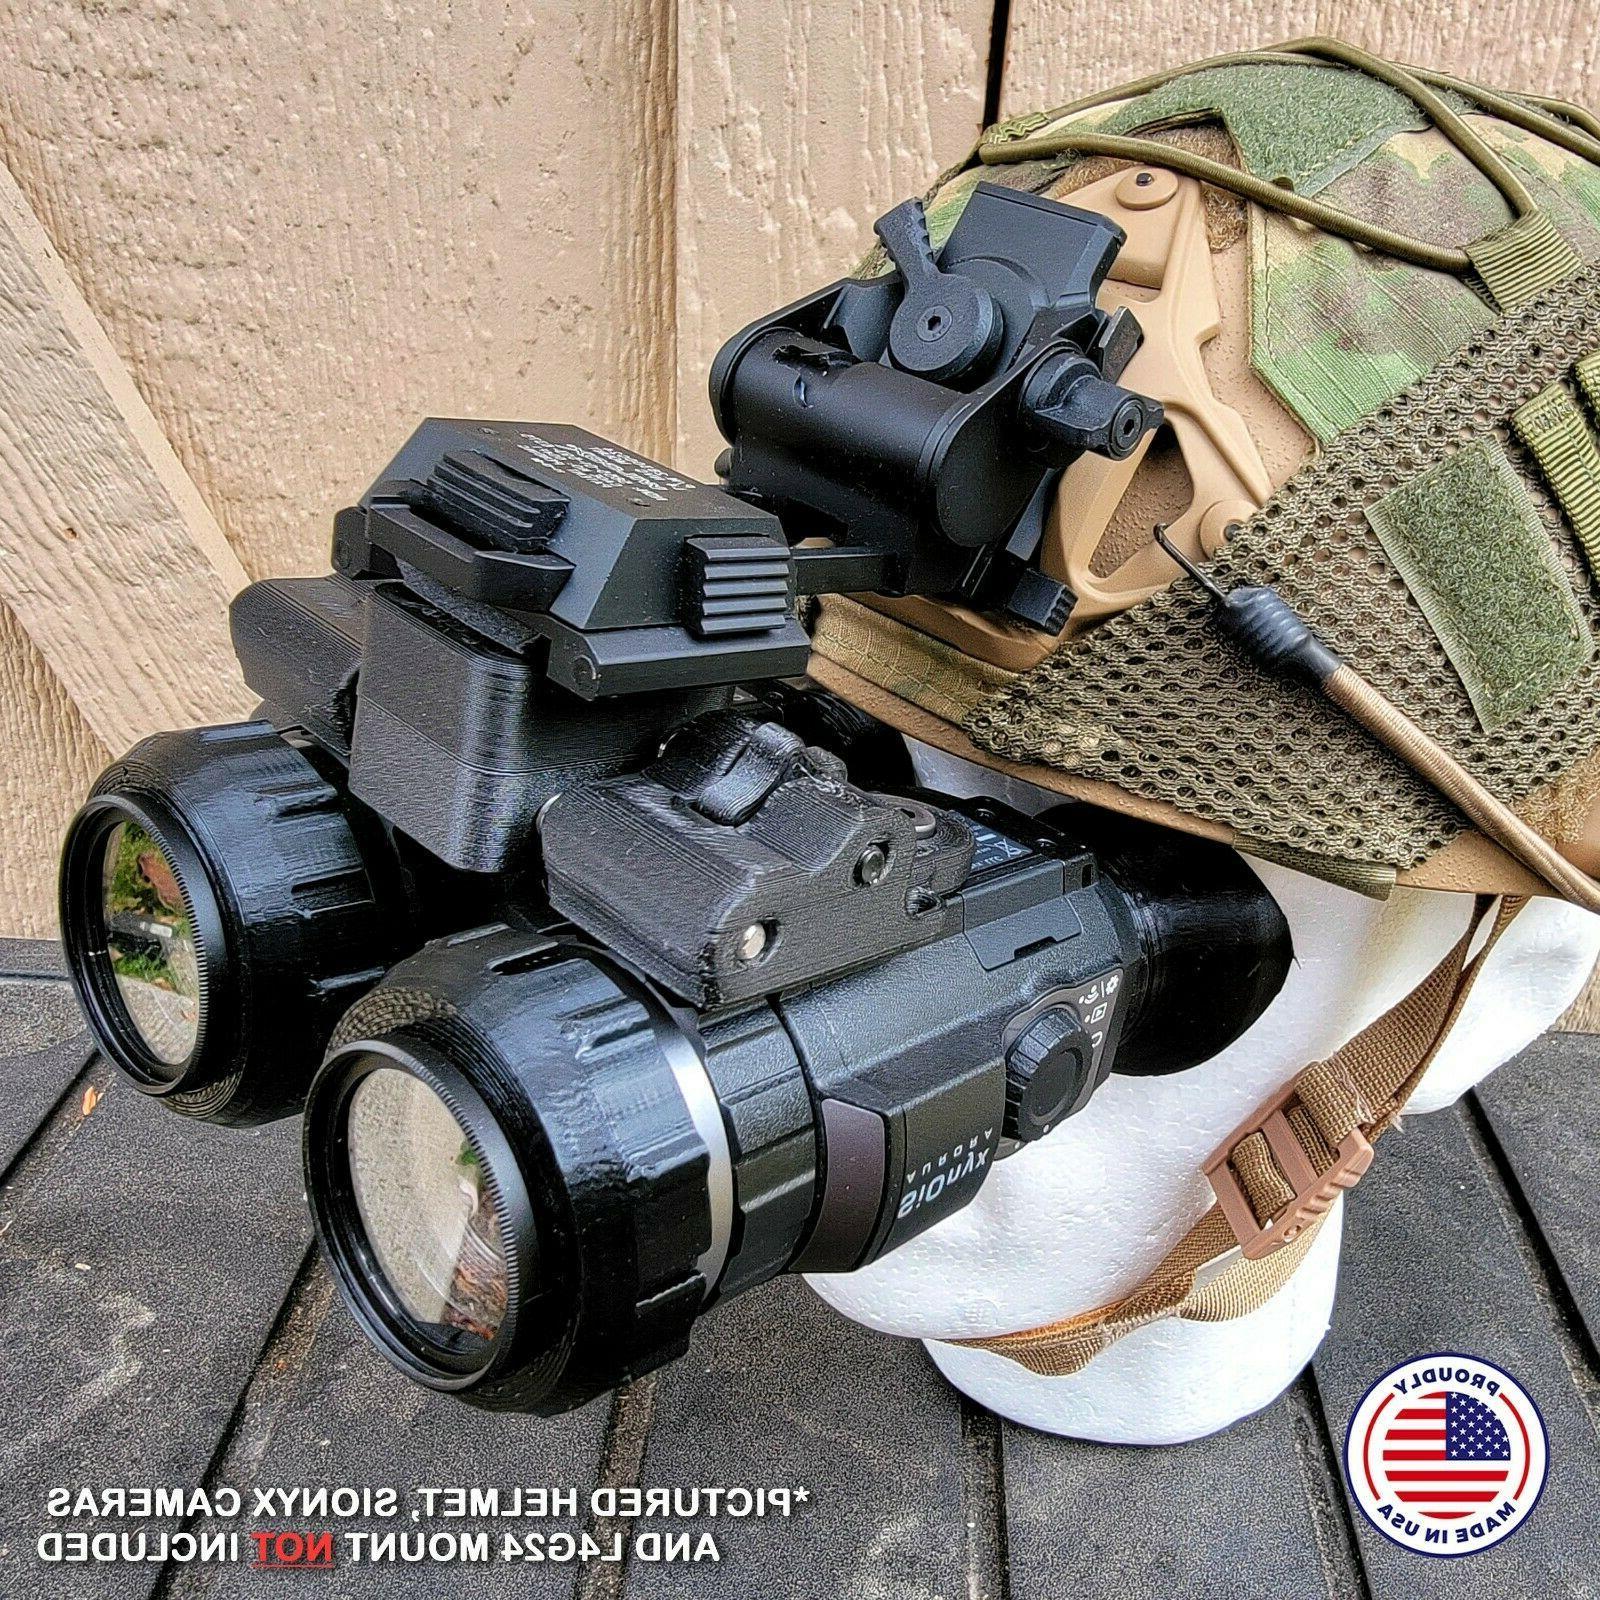 nightwatch sionyx aurora binocular bridge helmet night